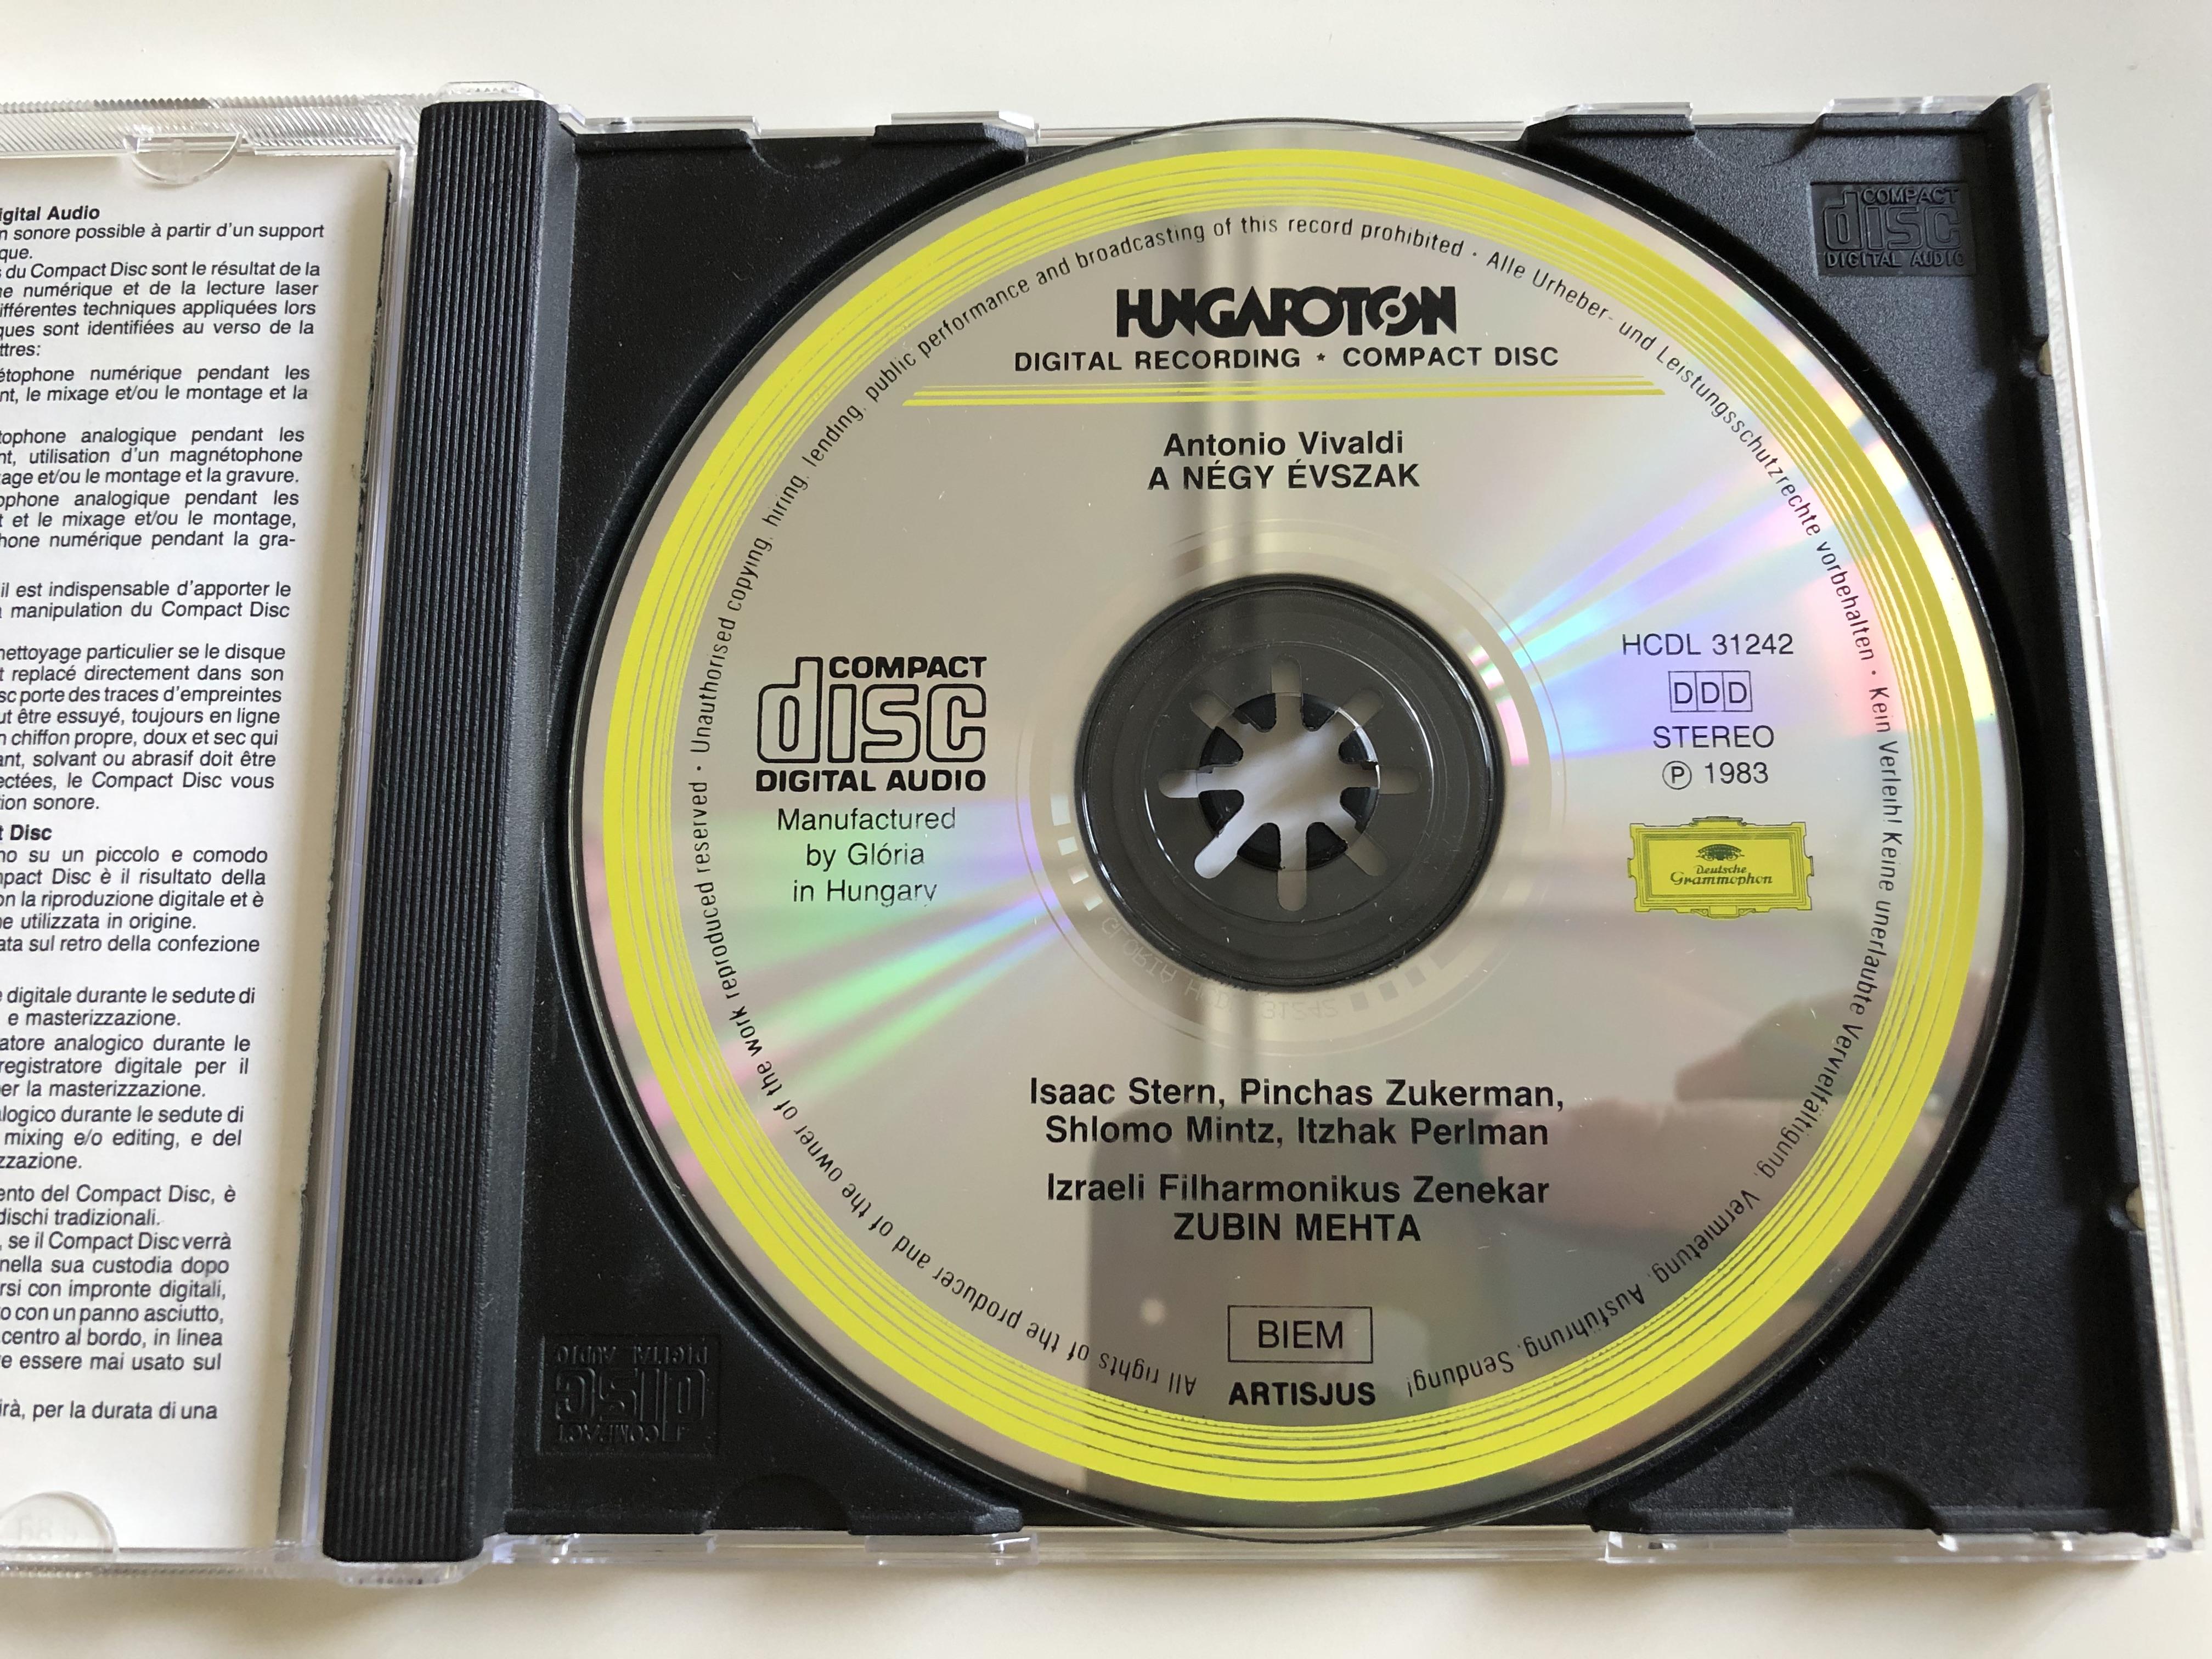 antonio-vivaldi-le-quattro-stagioni-the-four-seasons-stern-zukerman-mintz-perlman-israel-philharmonic-orchestra-conducted-by-zubin-mehta-hungaroton-audio-cd-1983-hcdl-31242-5-.jpg